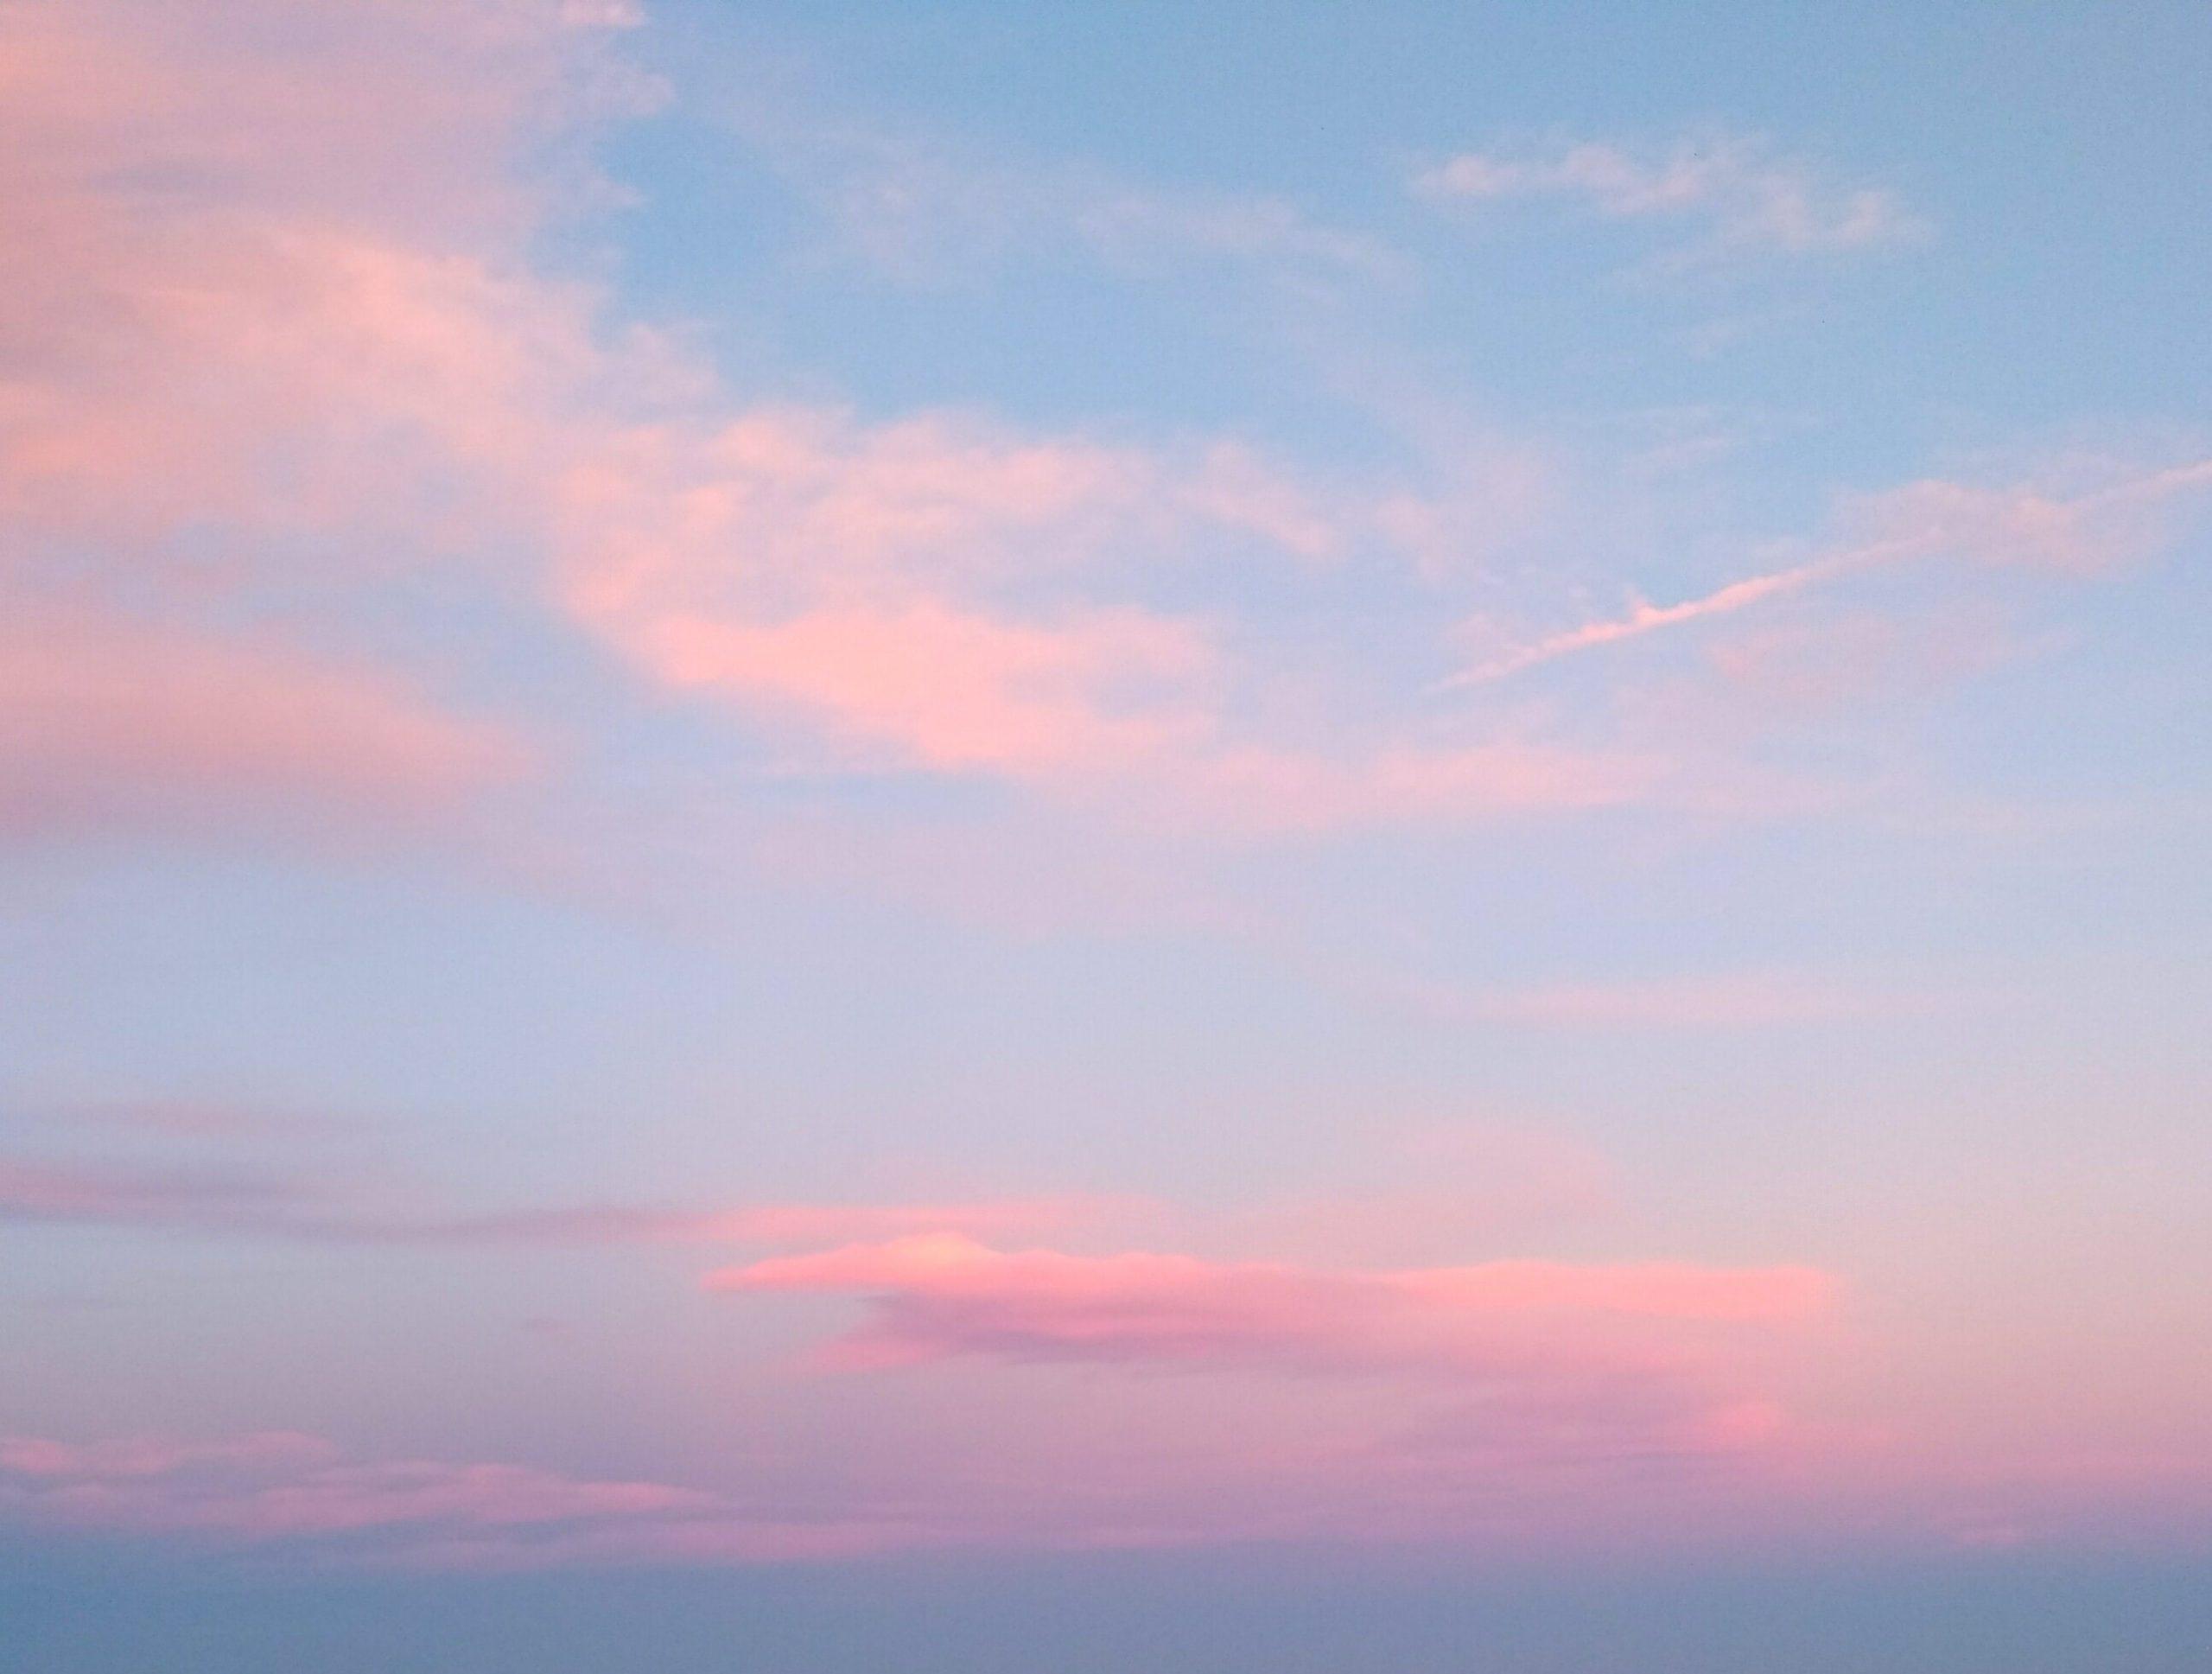 Awareness is like the sky